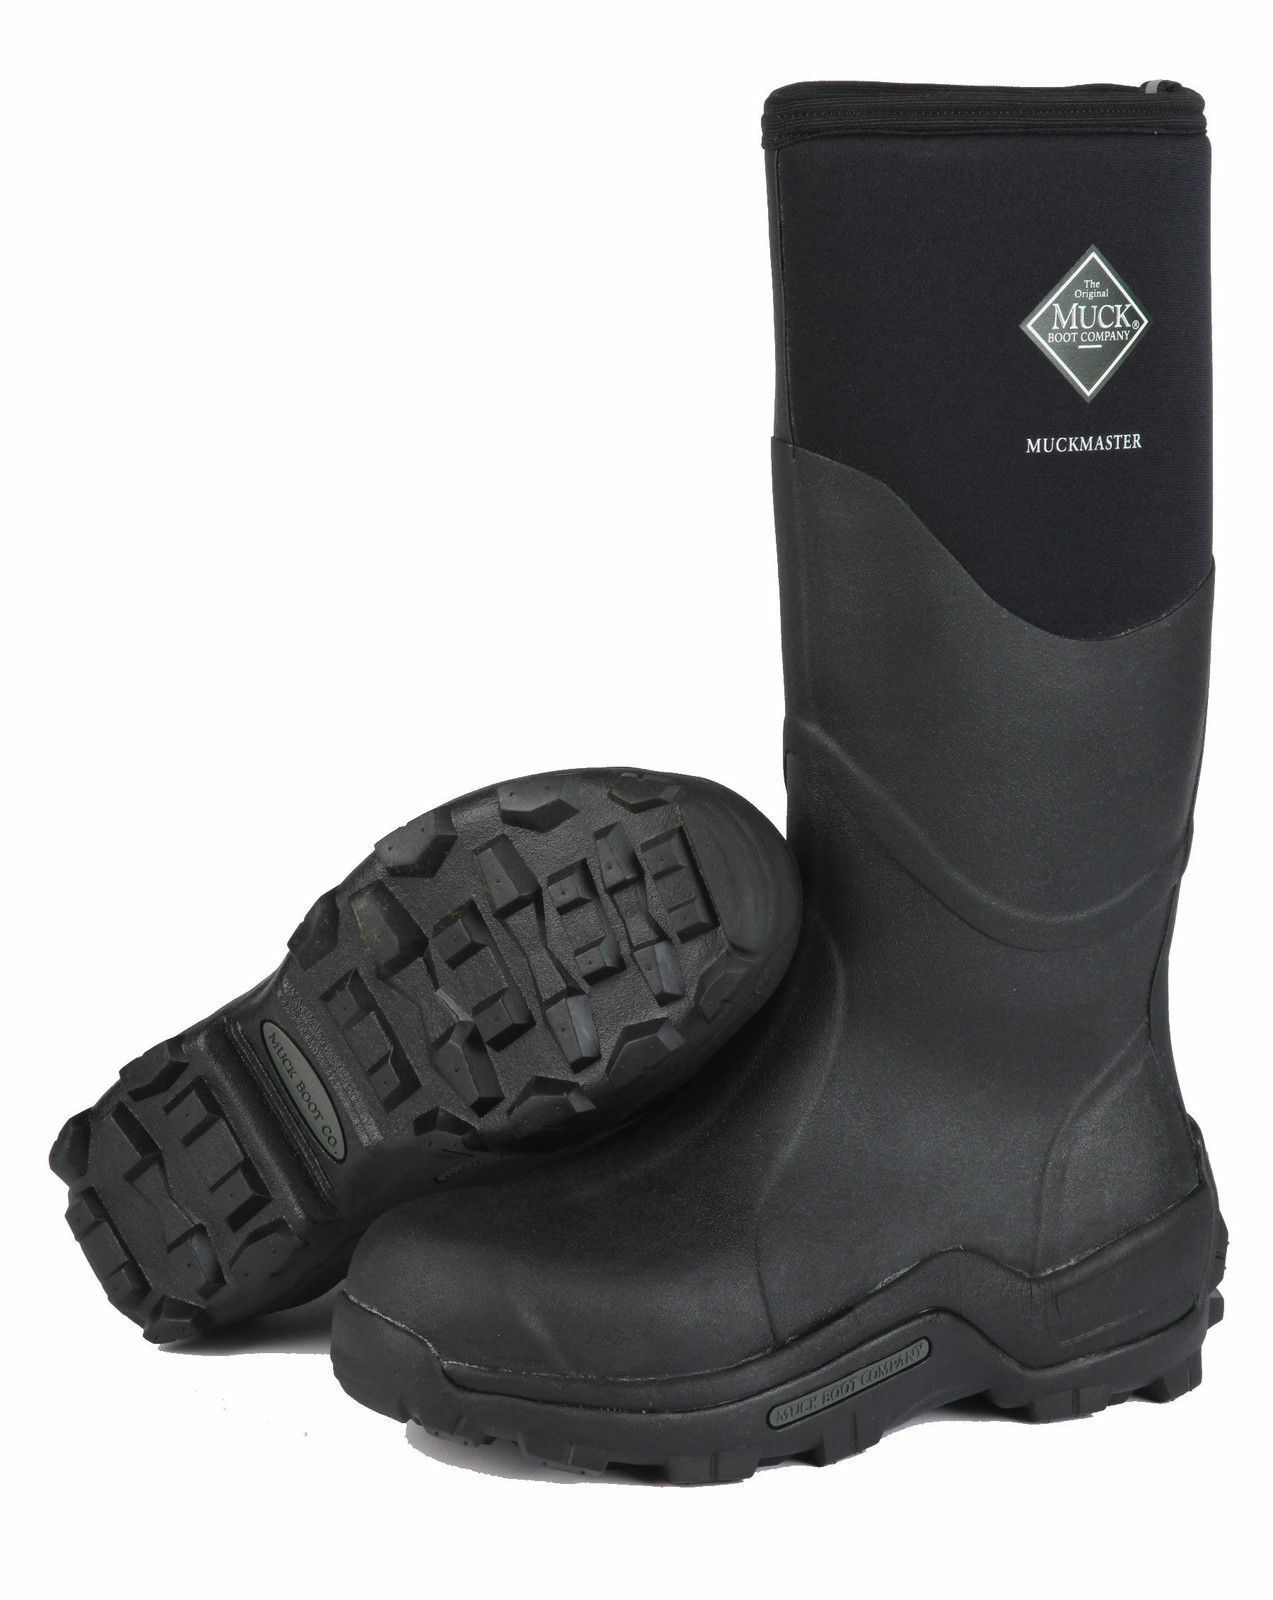 Muck MMH-500A Hombre Muckmaster Hi Comercial Grado botas de Trabajo Negro